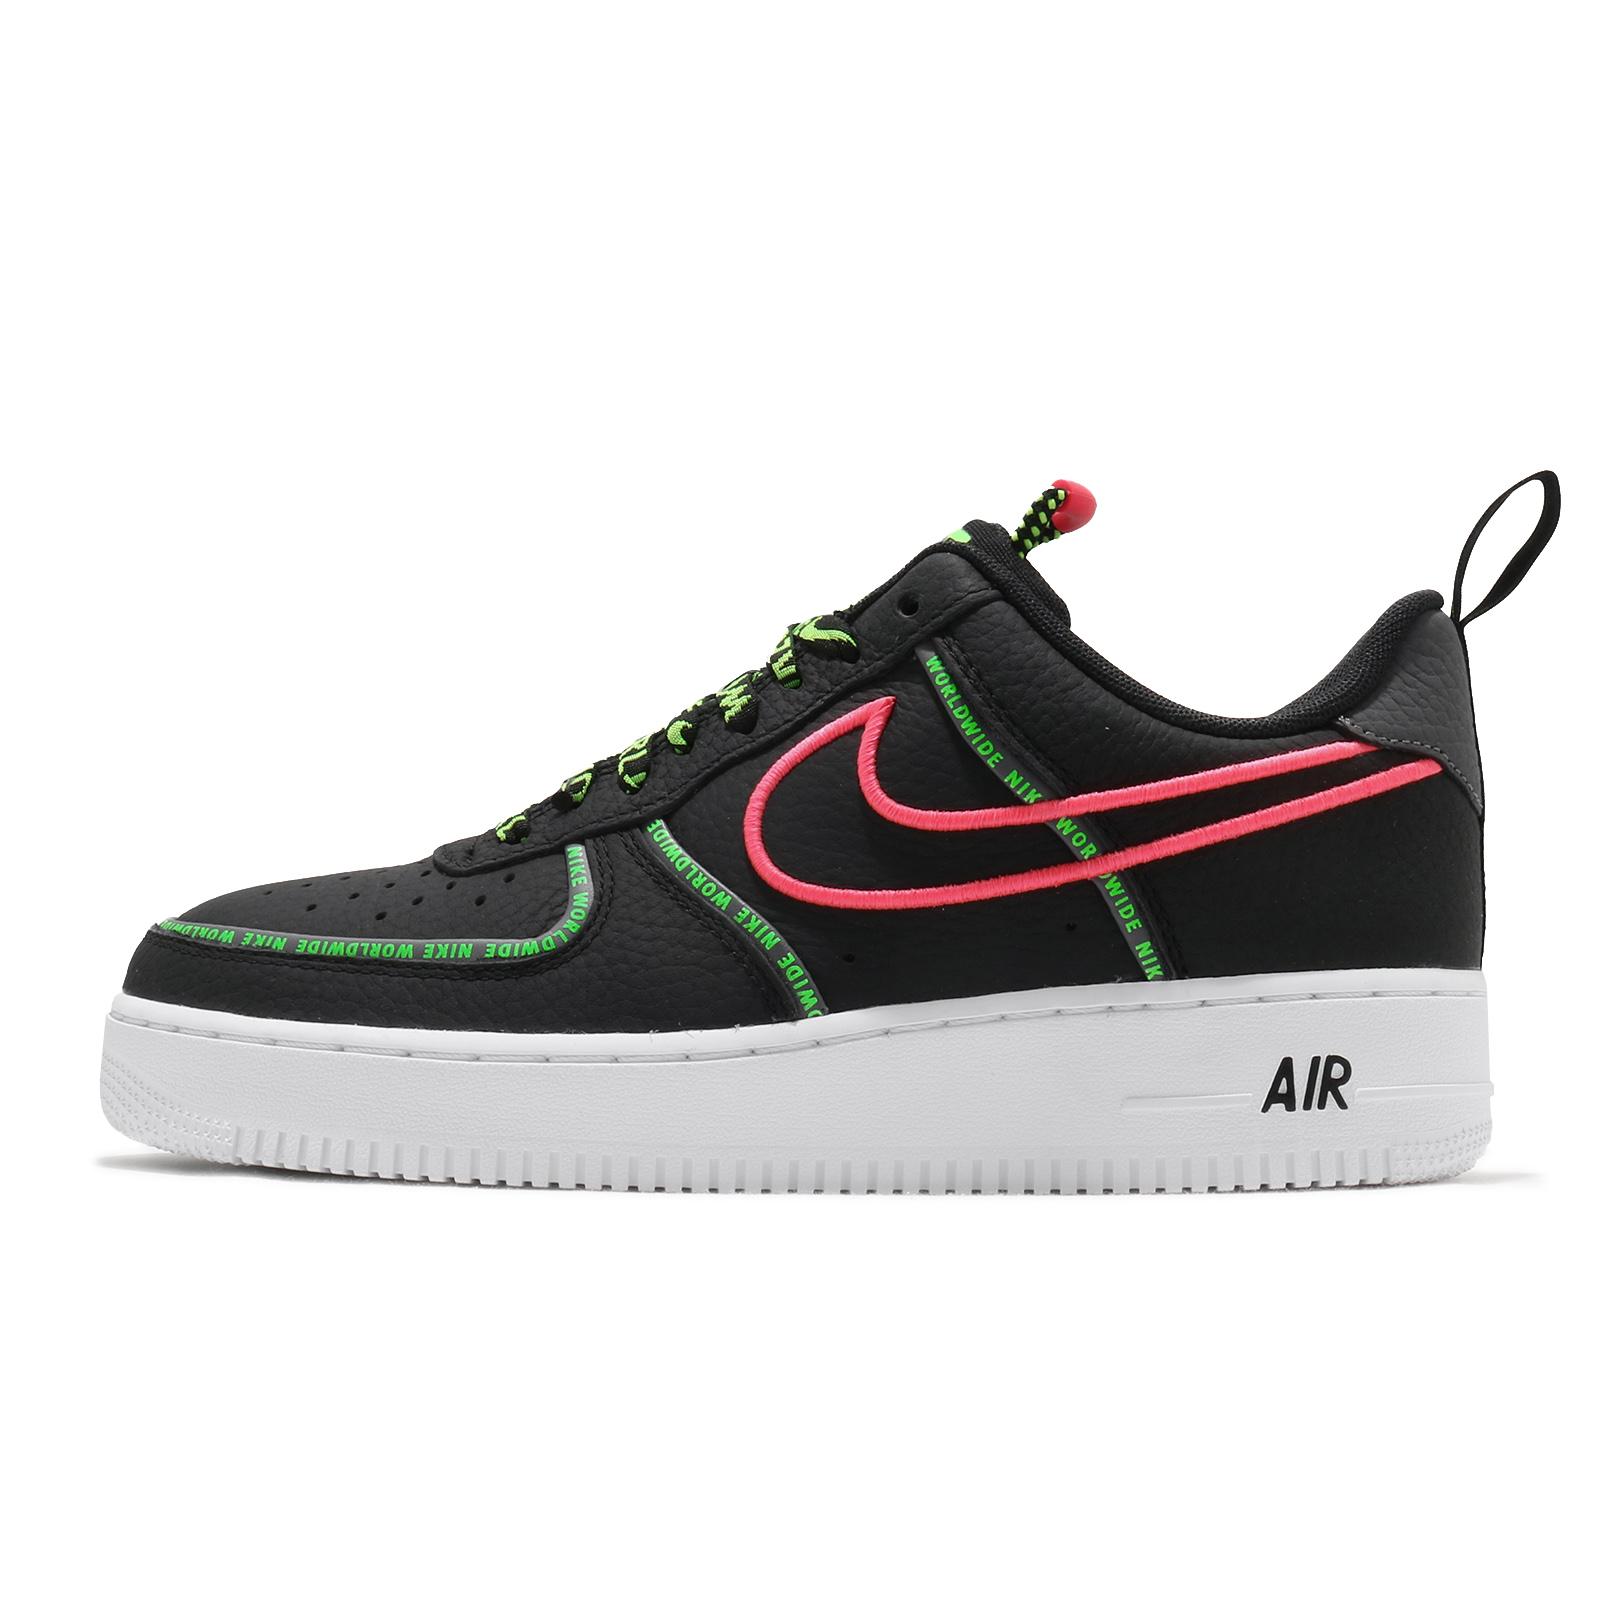 Nike 休閒鞋 Air Force 1 07 PRM WW 黑 綠 桃紅 男鞋 AF1 【ACS】 CK7213001